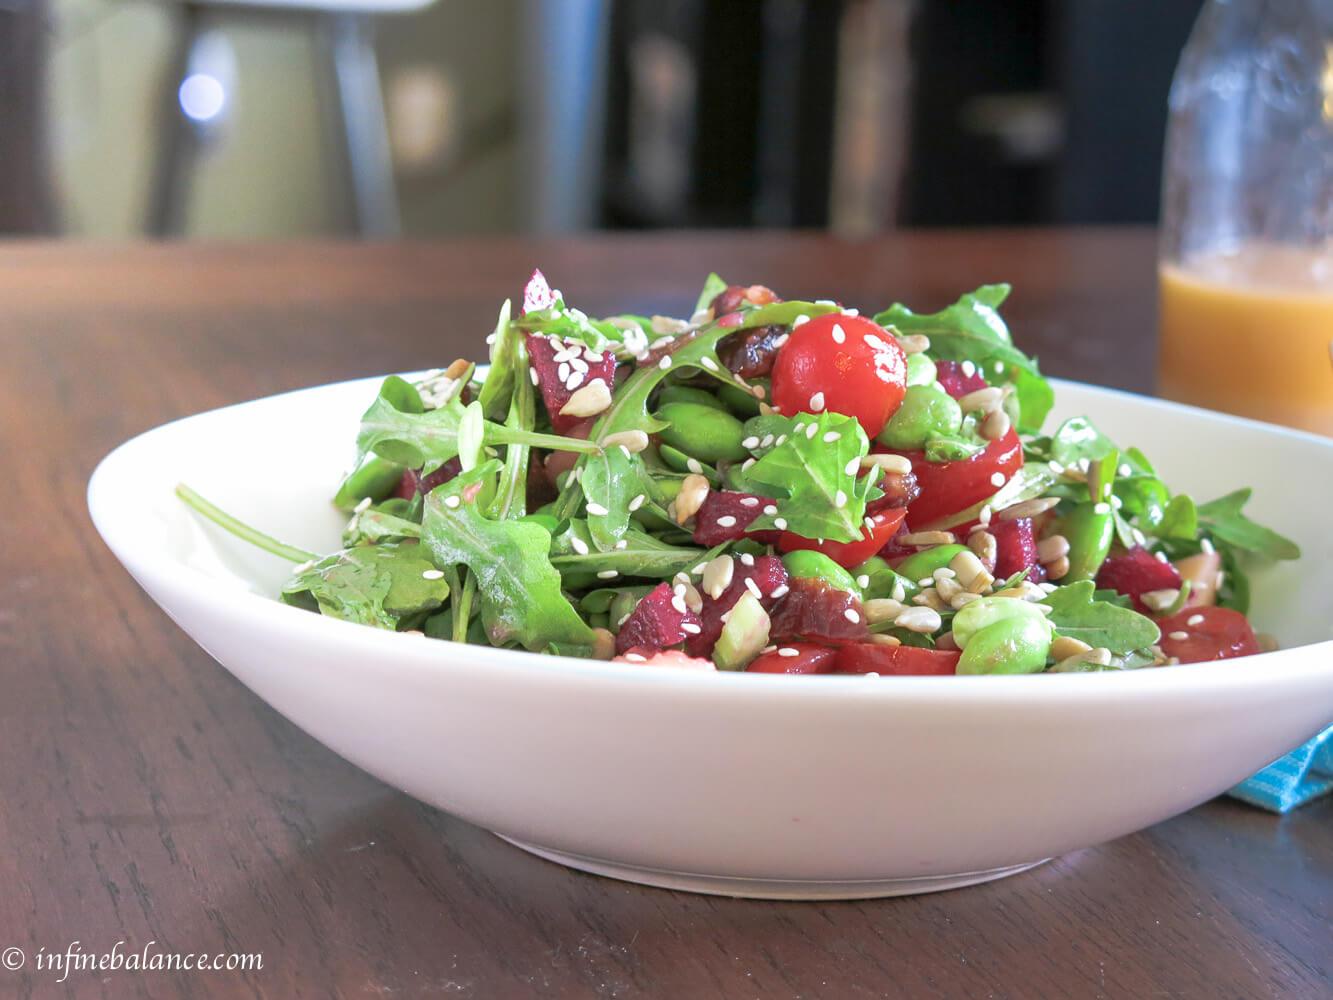 arugula and edamame salad | www.infinebalance.com #salad #vegetarian #recipe